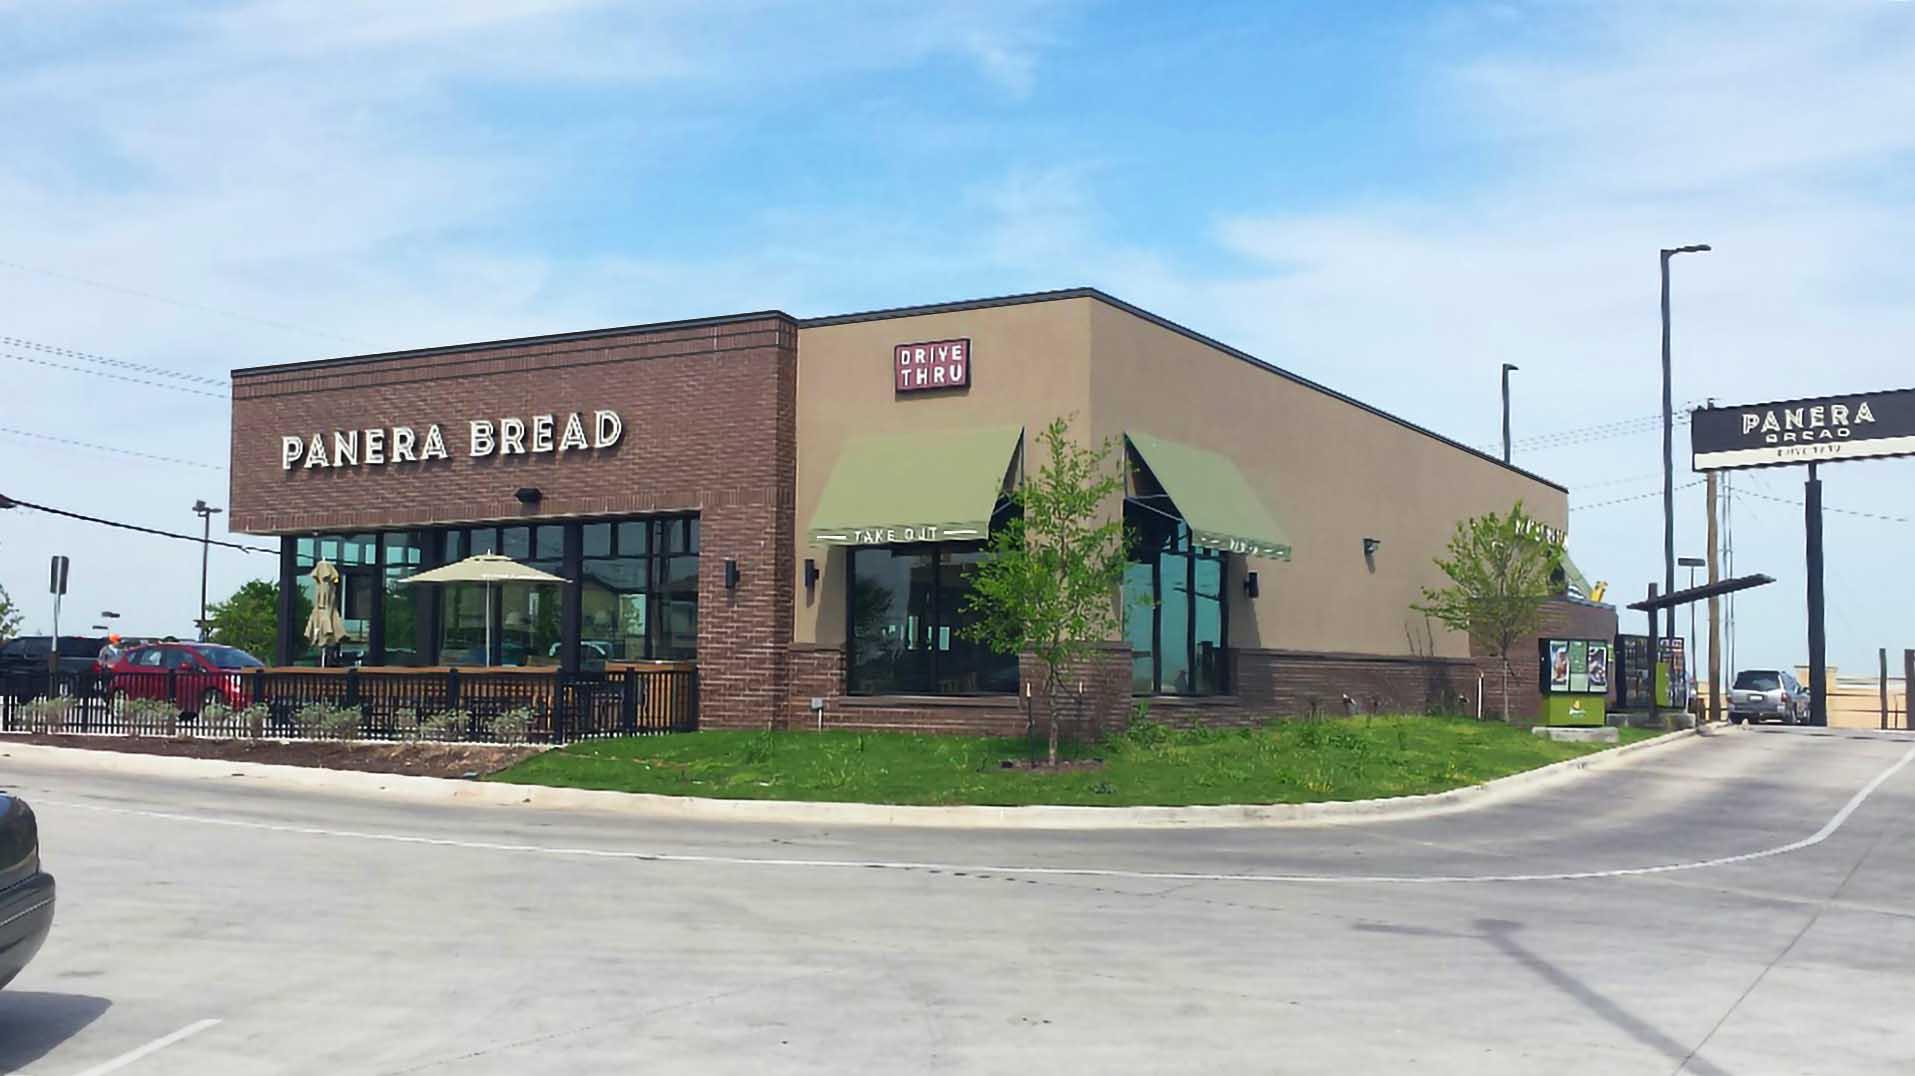 Verdad BTS Project - Panera Bread - Weatherford, TX.jpg